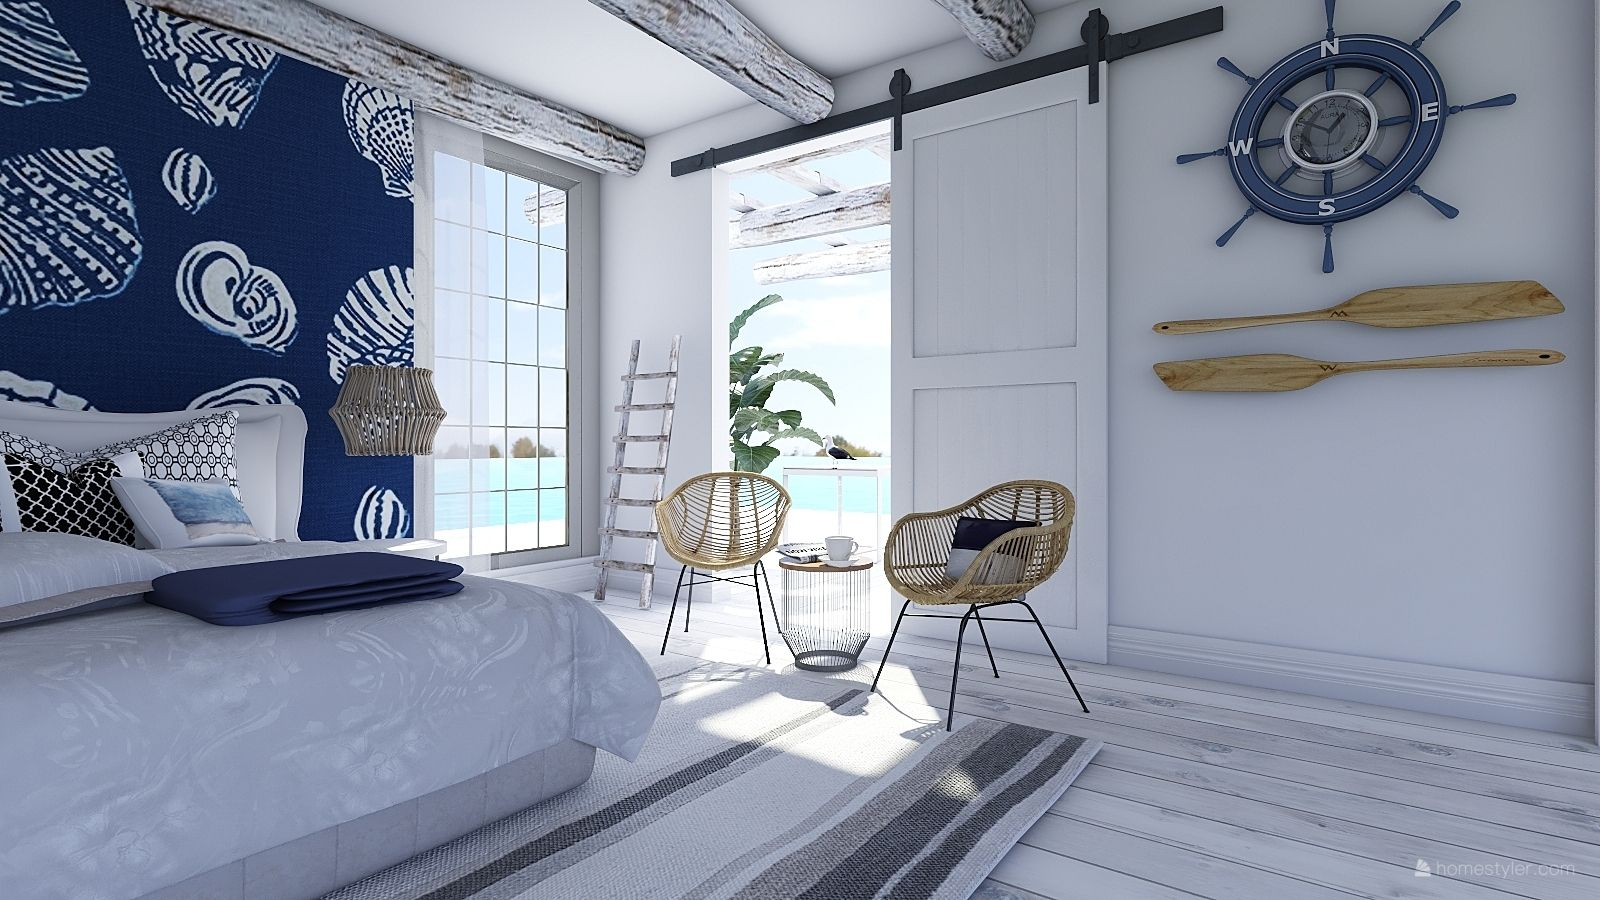 Bedroom design by SvetlySveva | Home design software, 3d ...